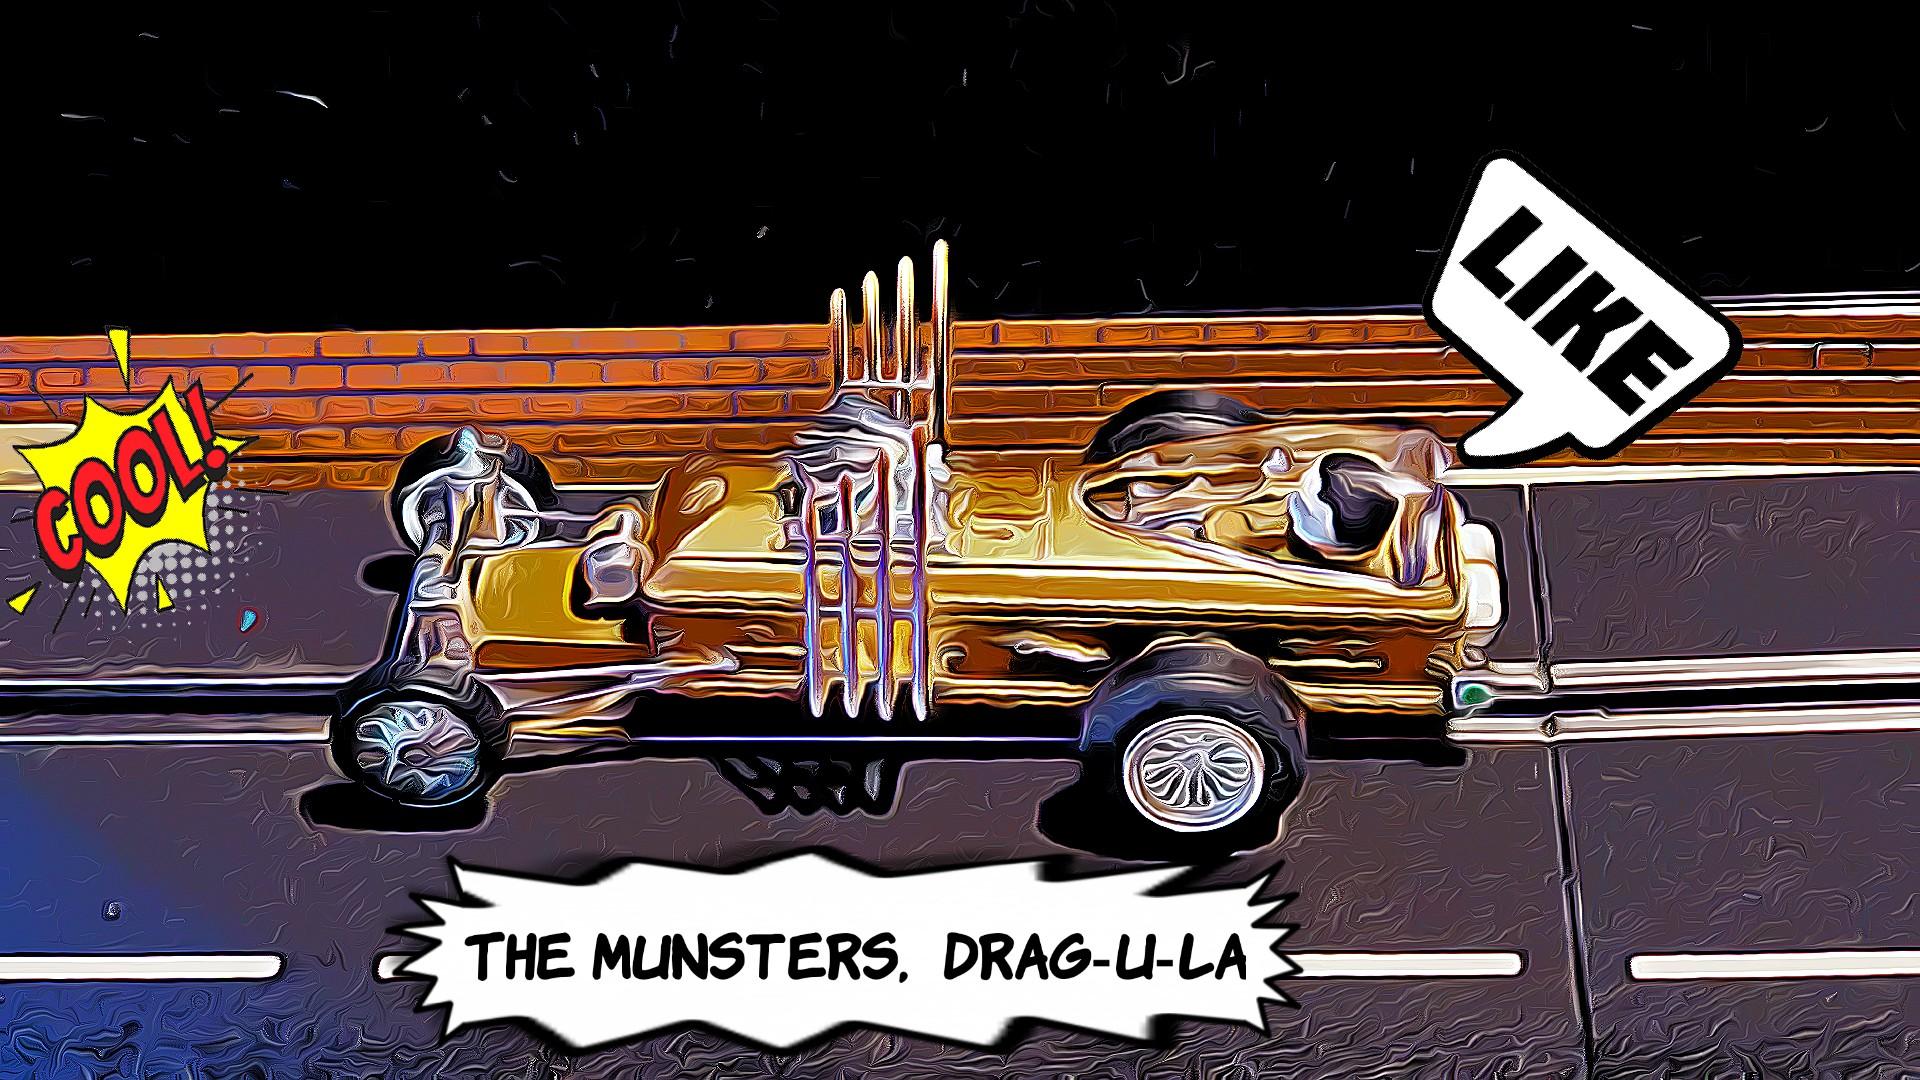 * SALE *The Munster's' Grandpa's DRAG-U-LA Dragster Slot Car 1/24 Scale